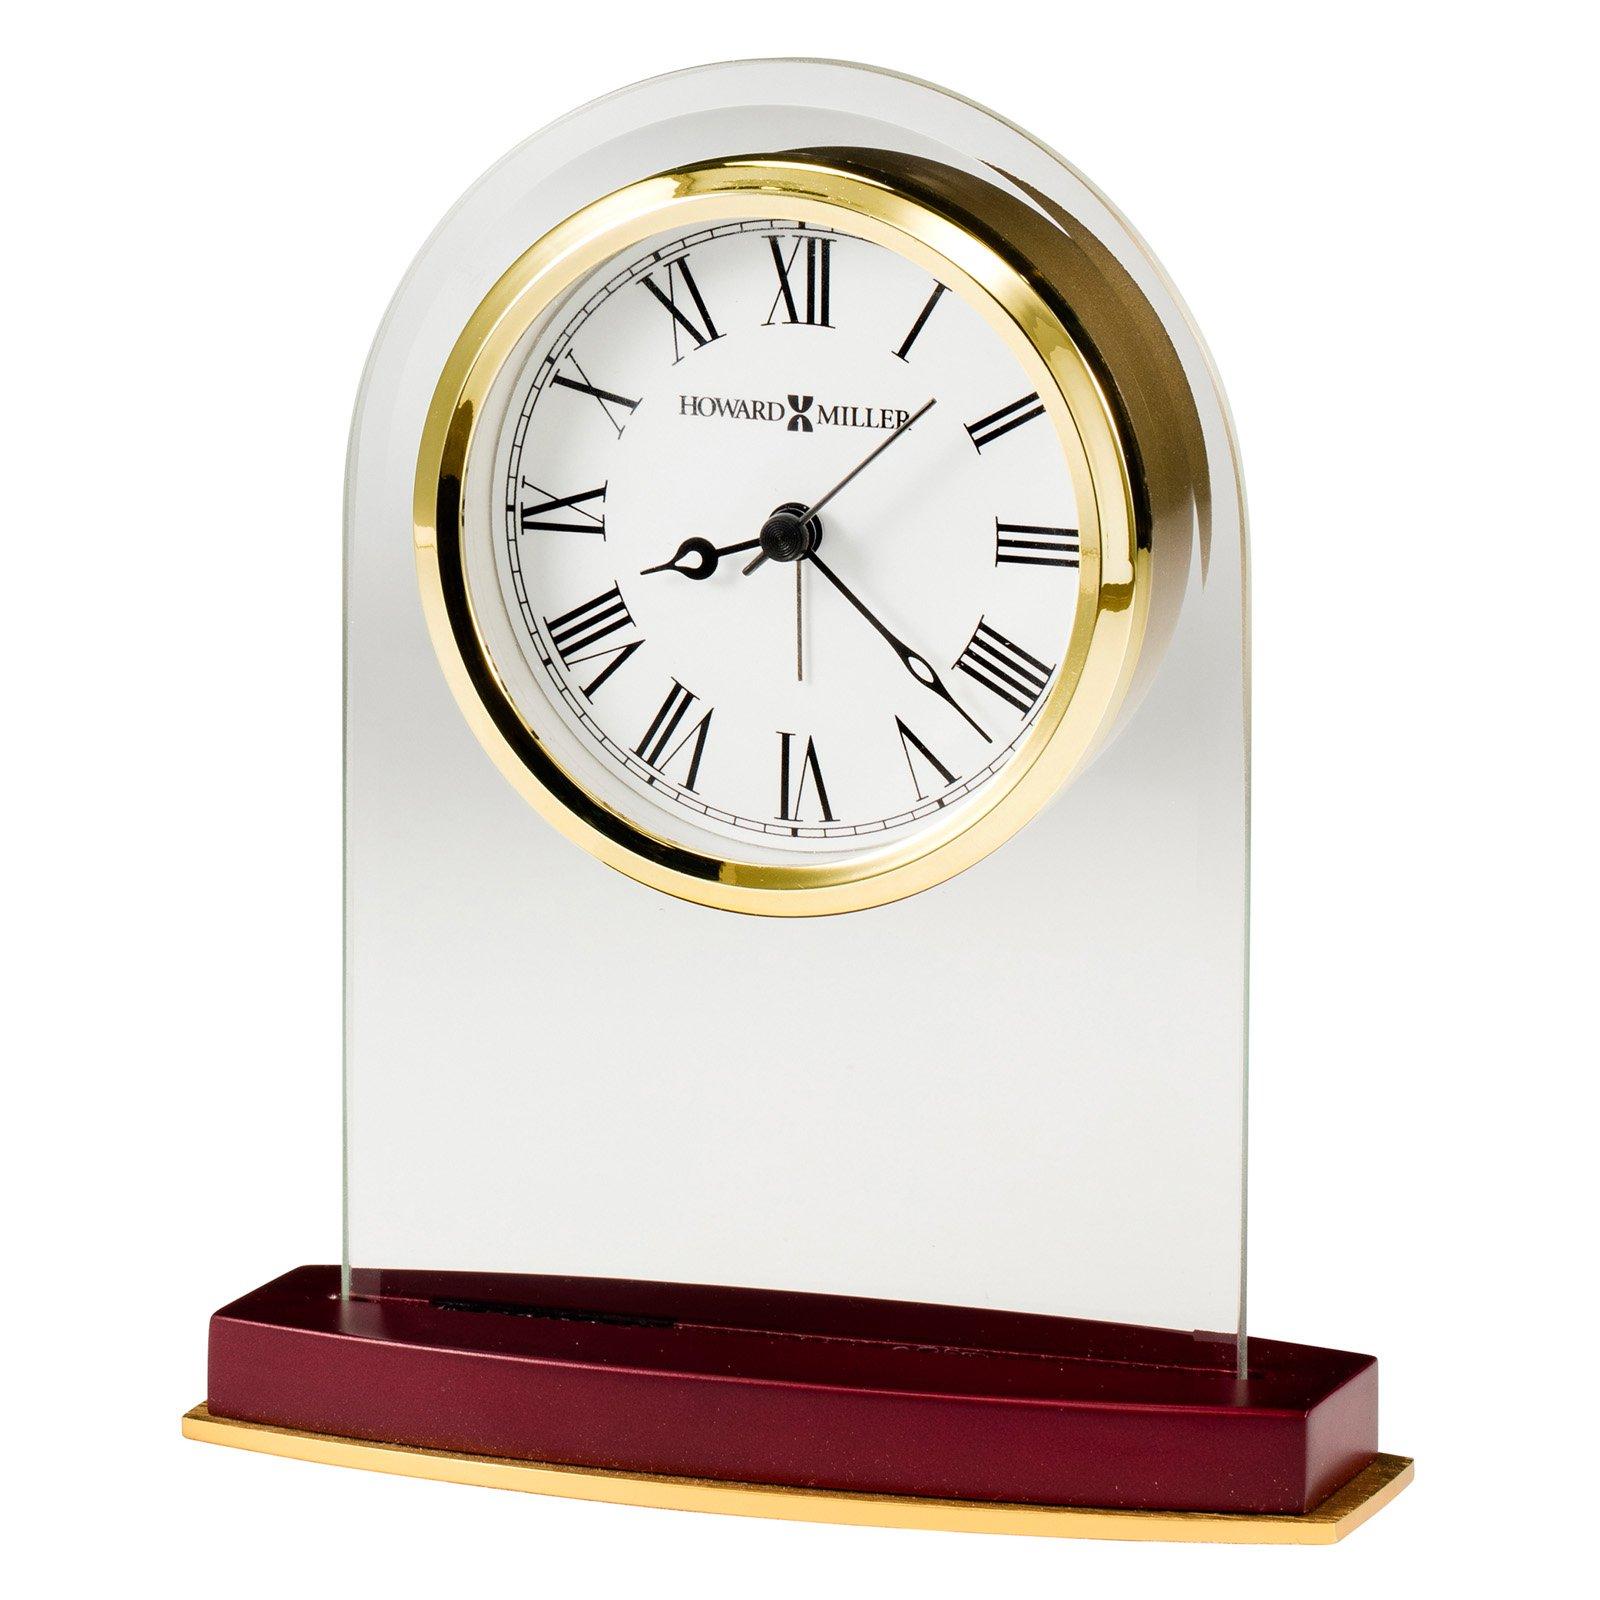 Howard Miller 5.5 in. Anson Desk Clock by Howard Miller